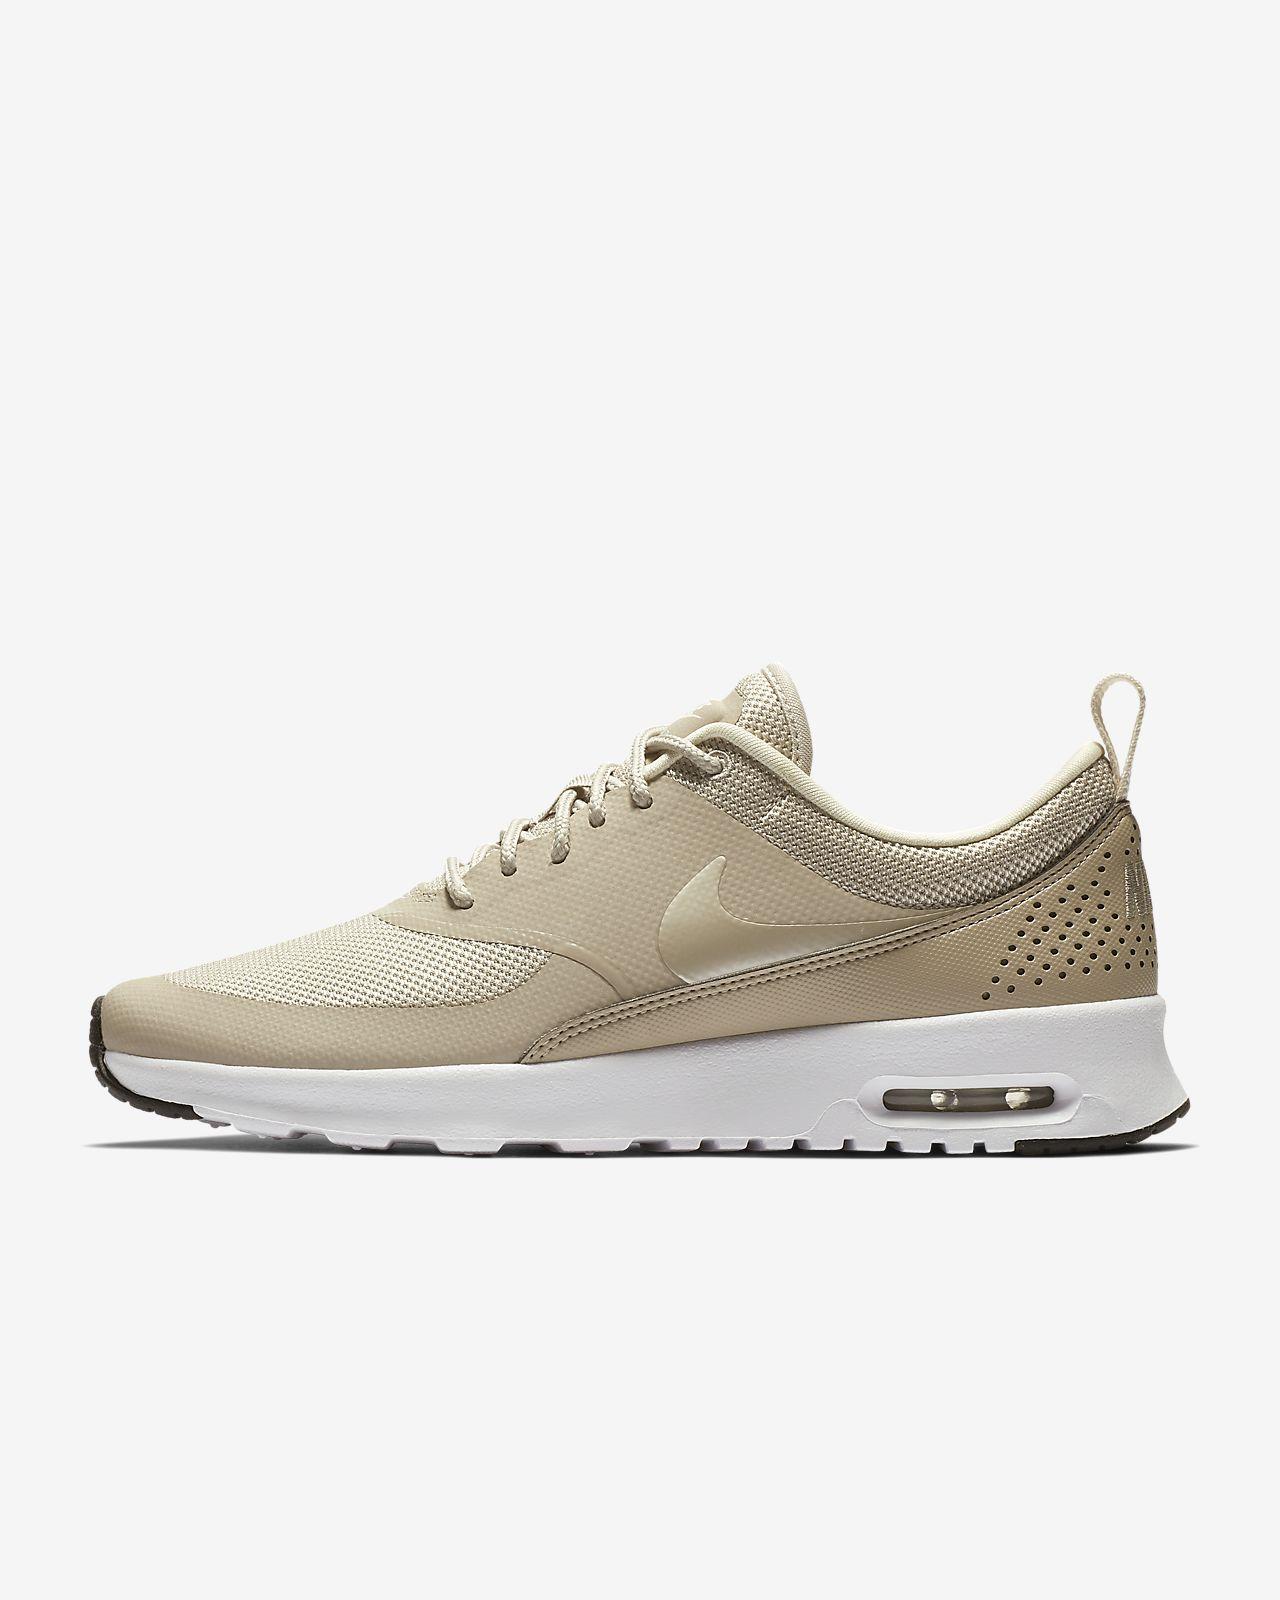 9190a5dab5c ... ireland calzado para mujer nike air max thea e238c fa49b ...